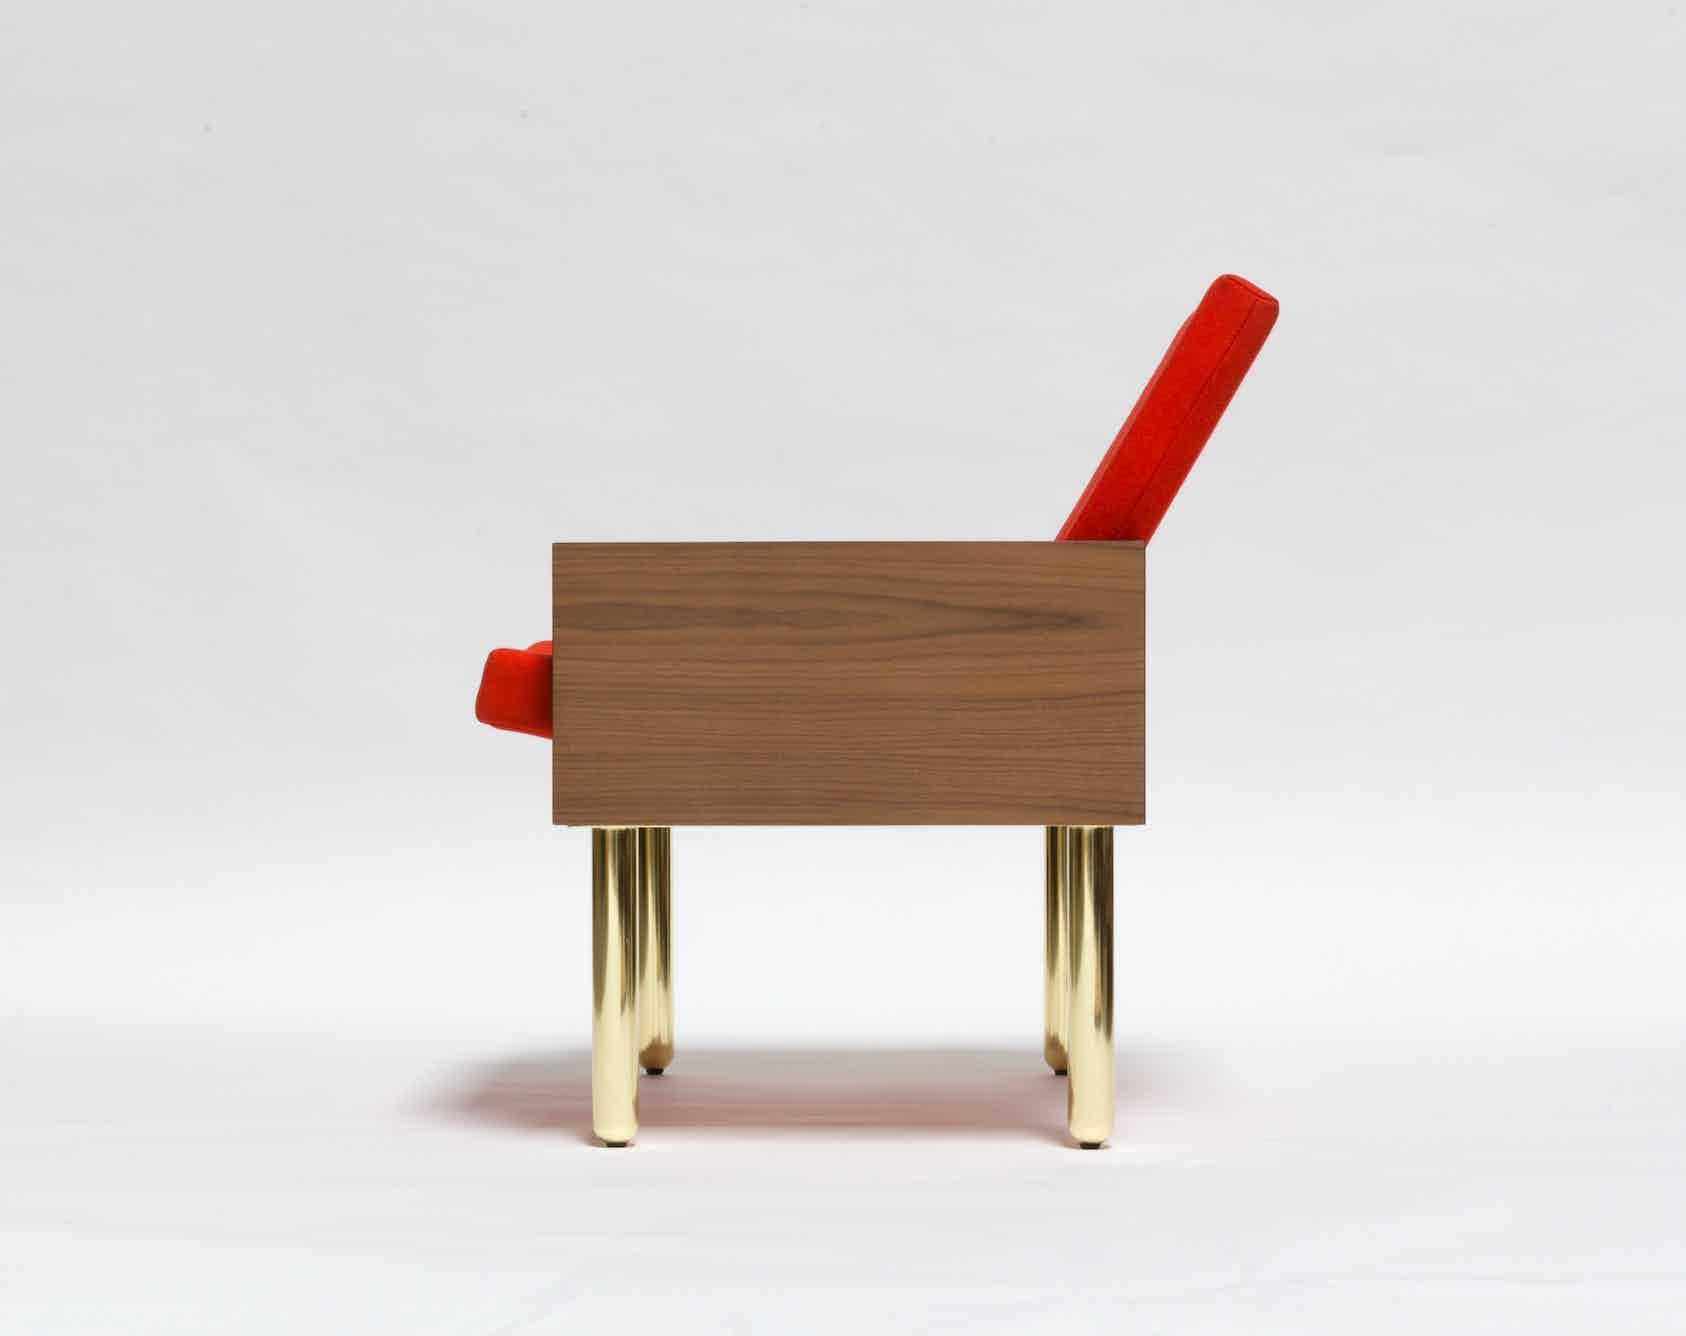 La-chance-furniture-block-armchair-side-haute-living